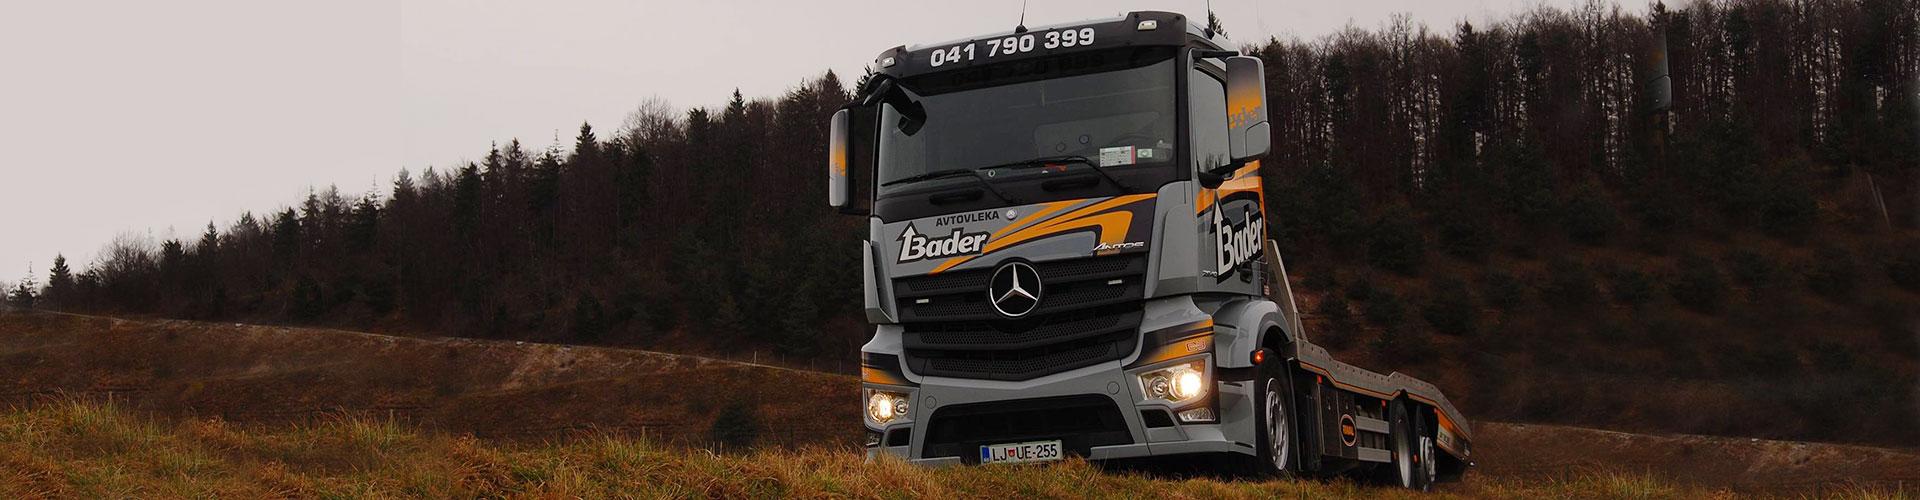 Bader prevozi 041 790 399